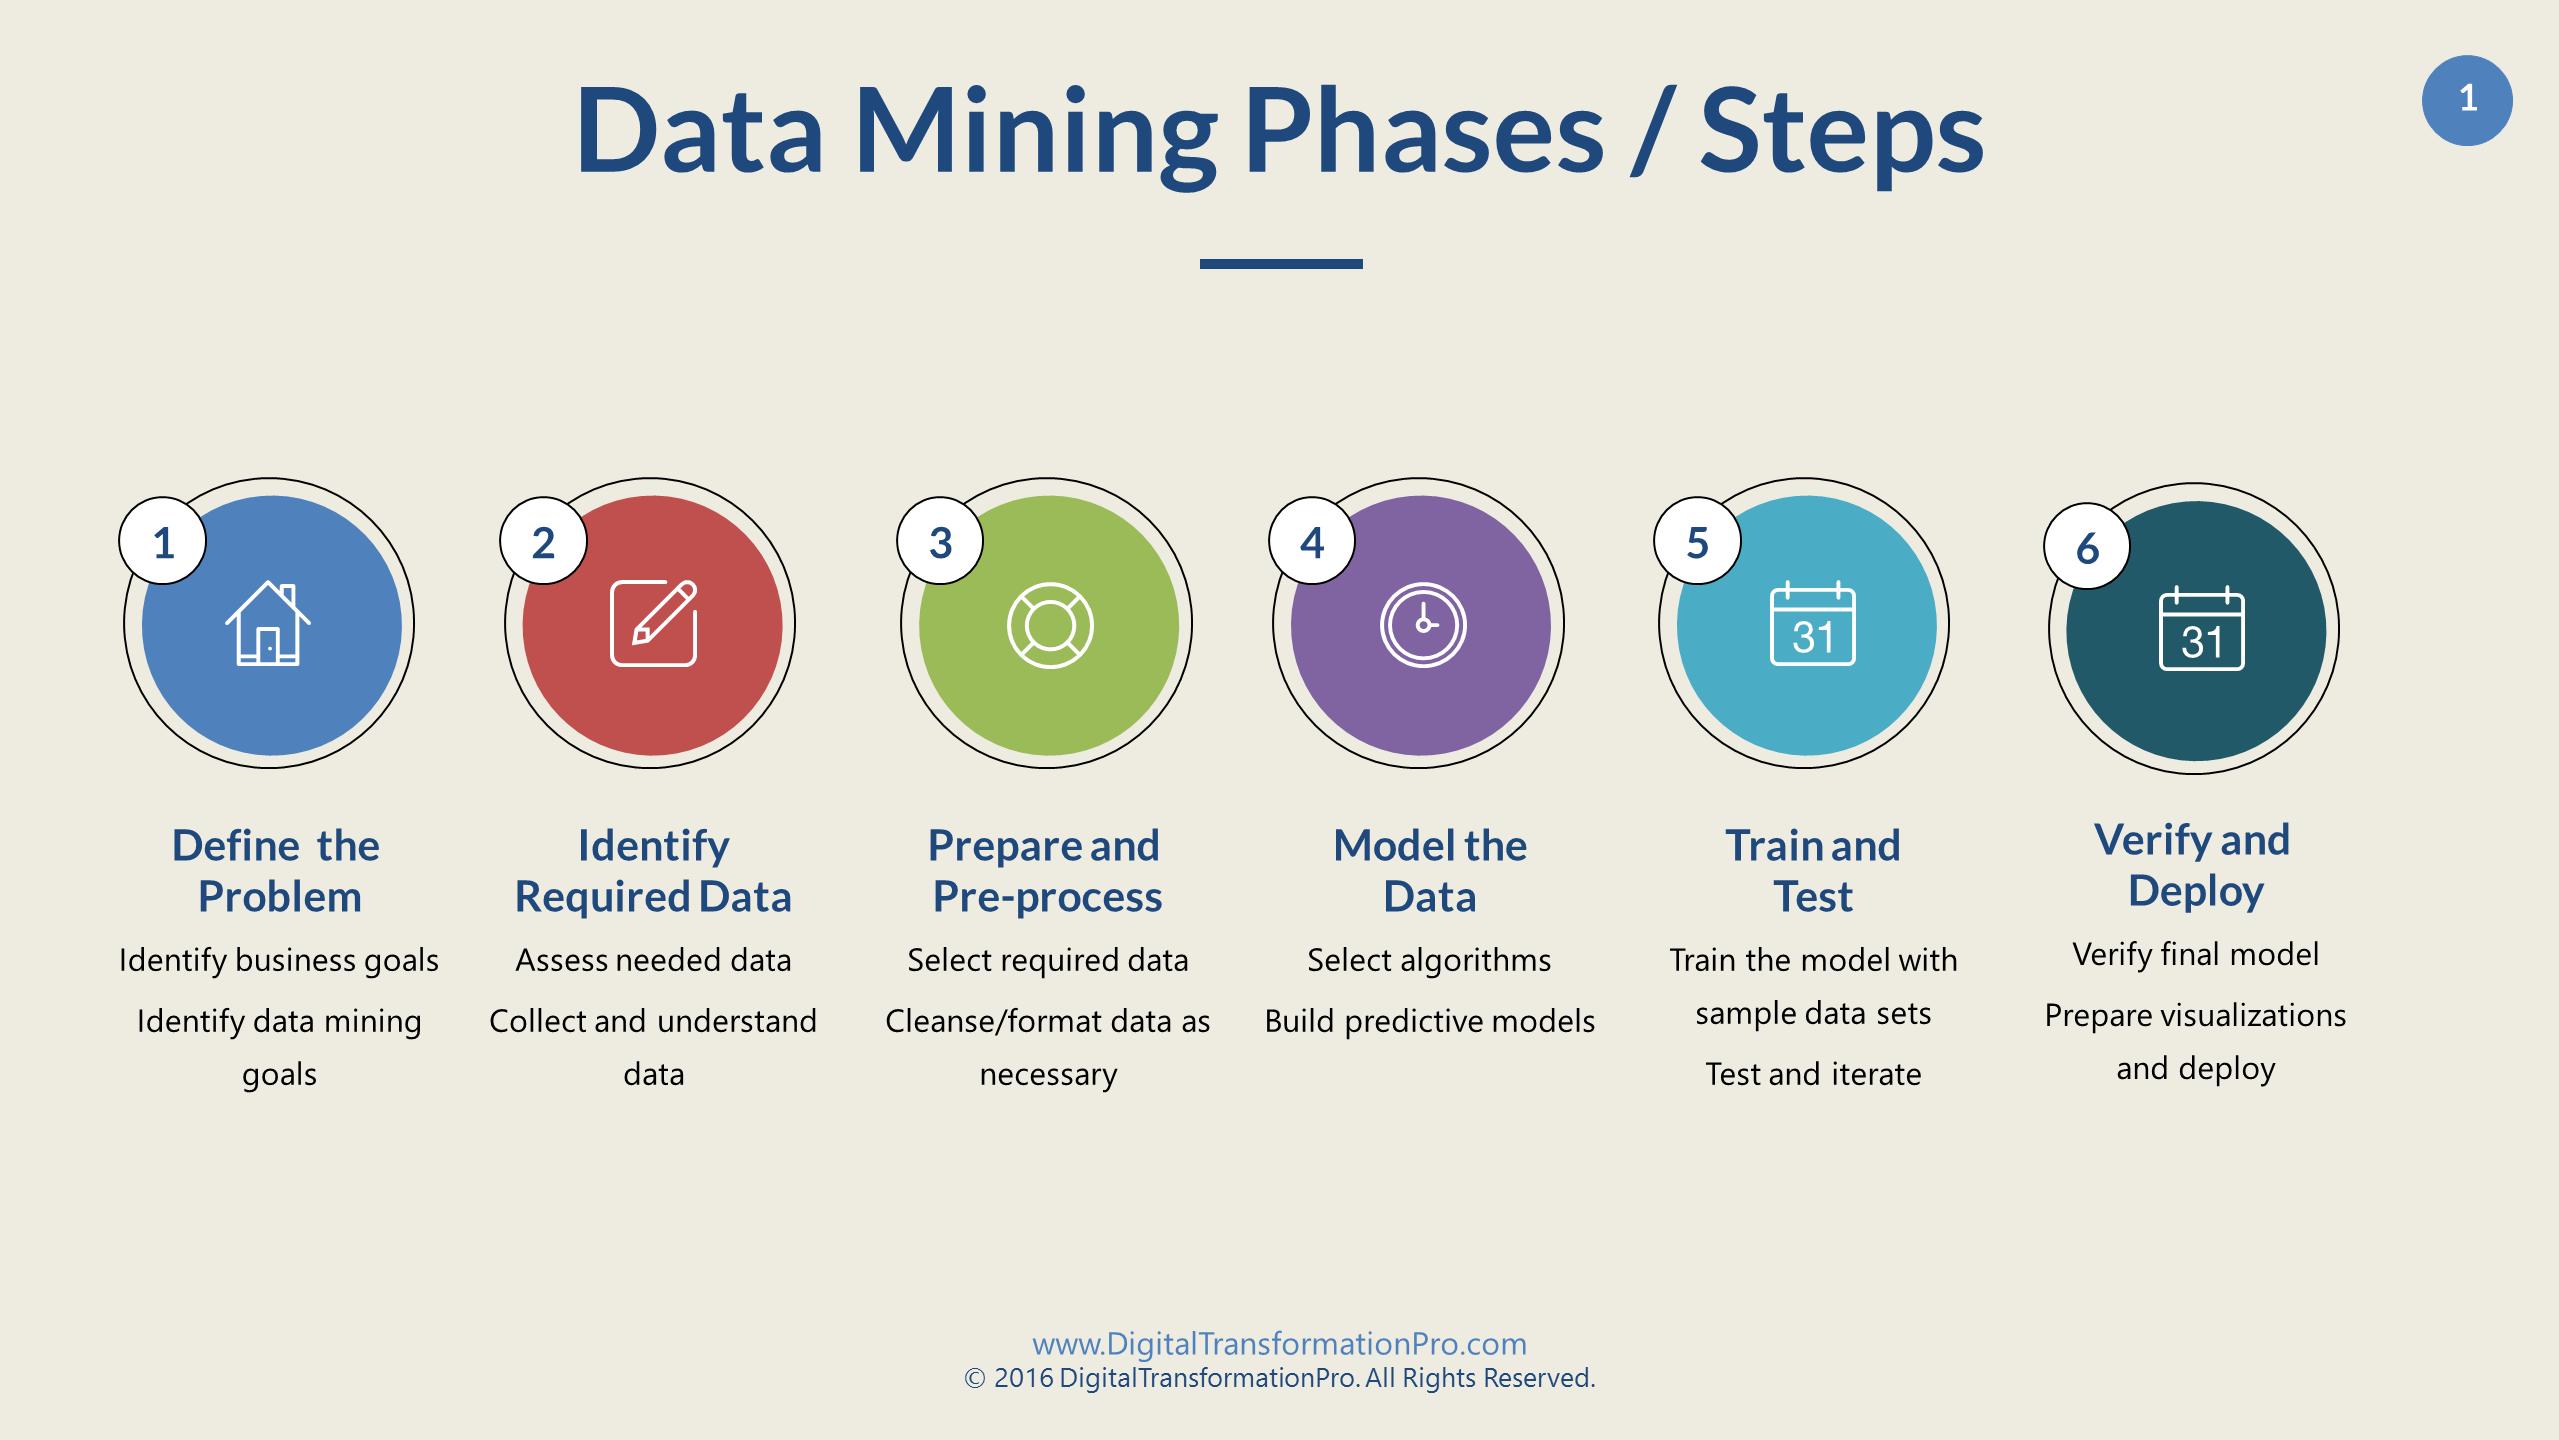 Data mining steps